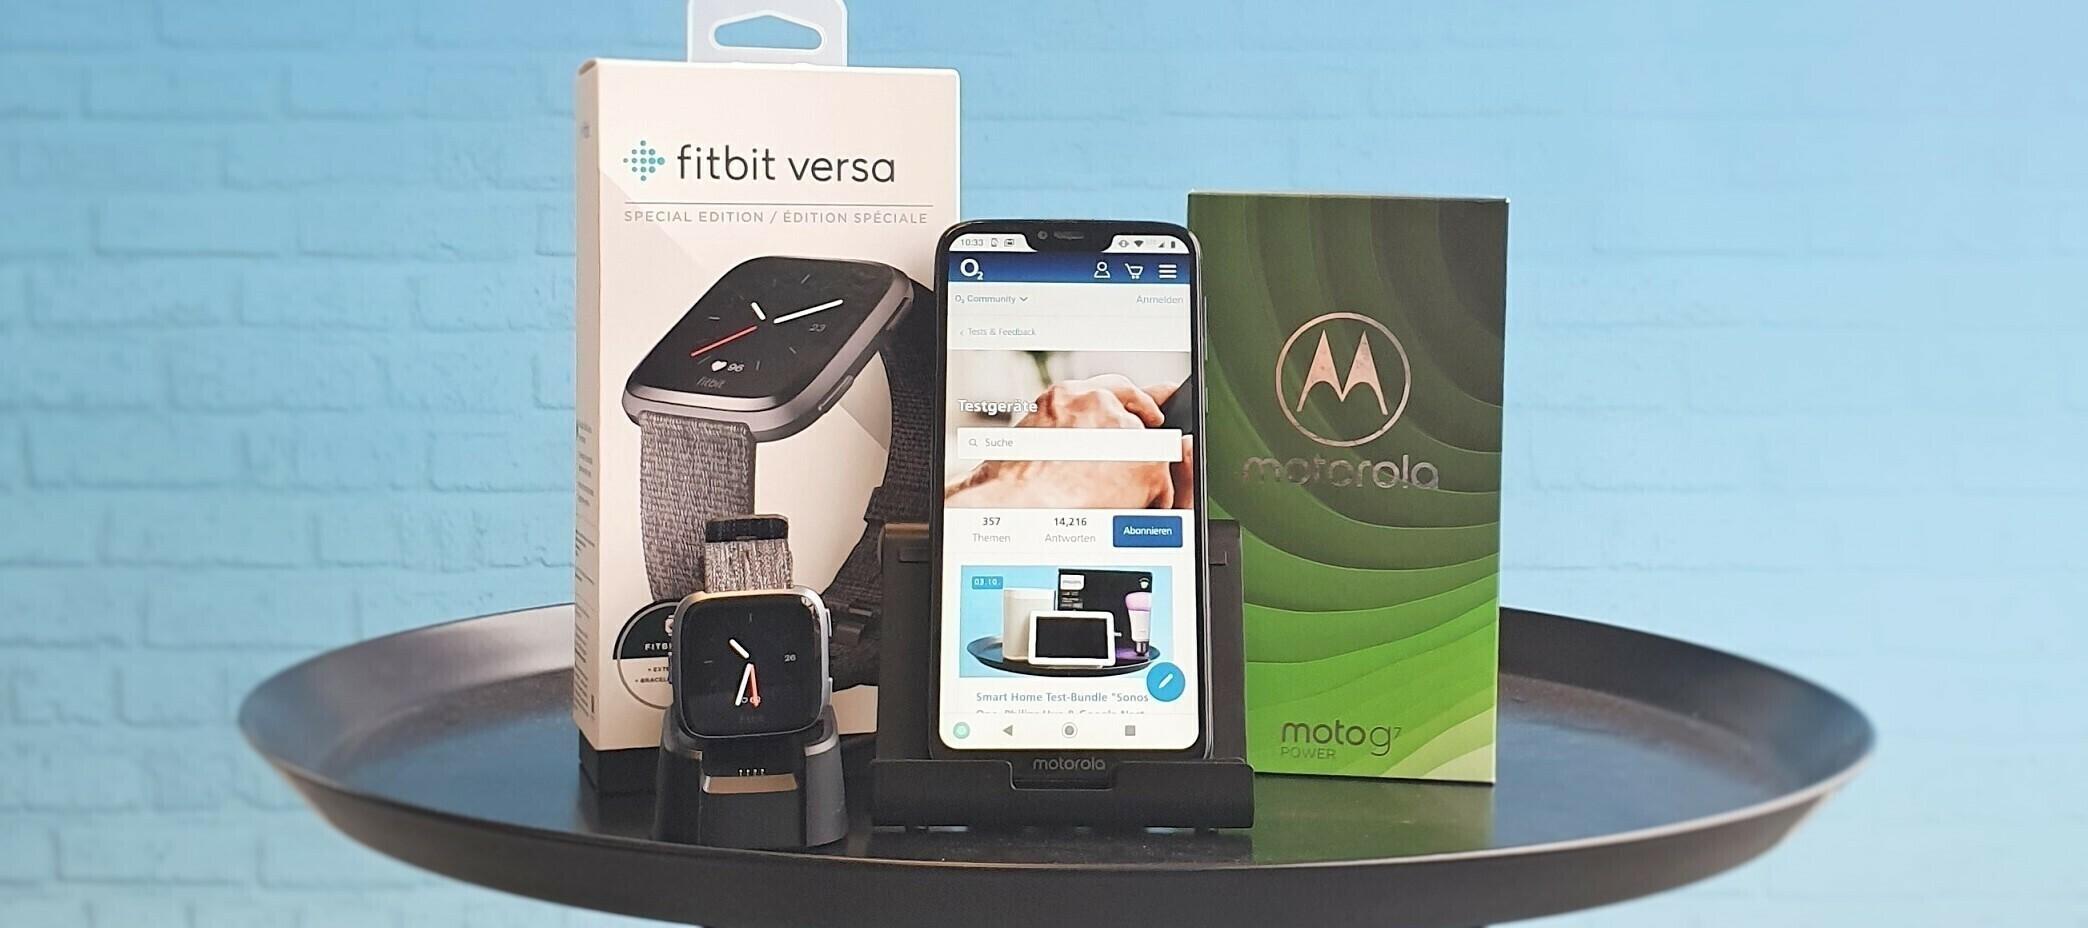 Motorola Moto G7 Power & Fitbit Versa Special Edition - Teste das Bundle voller Power!